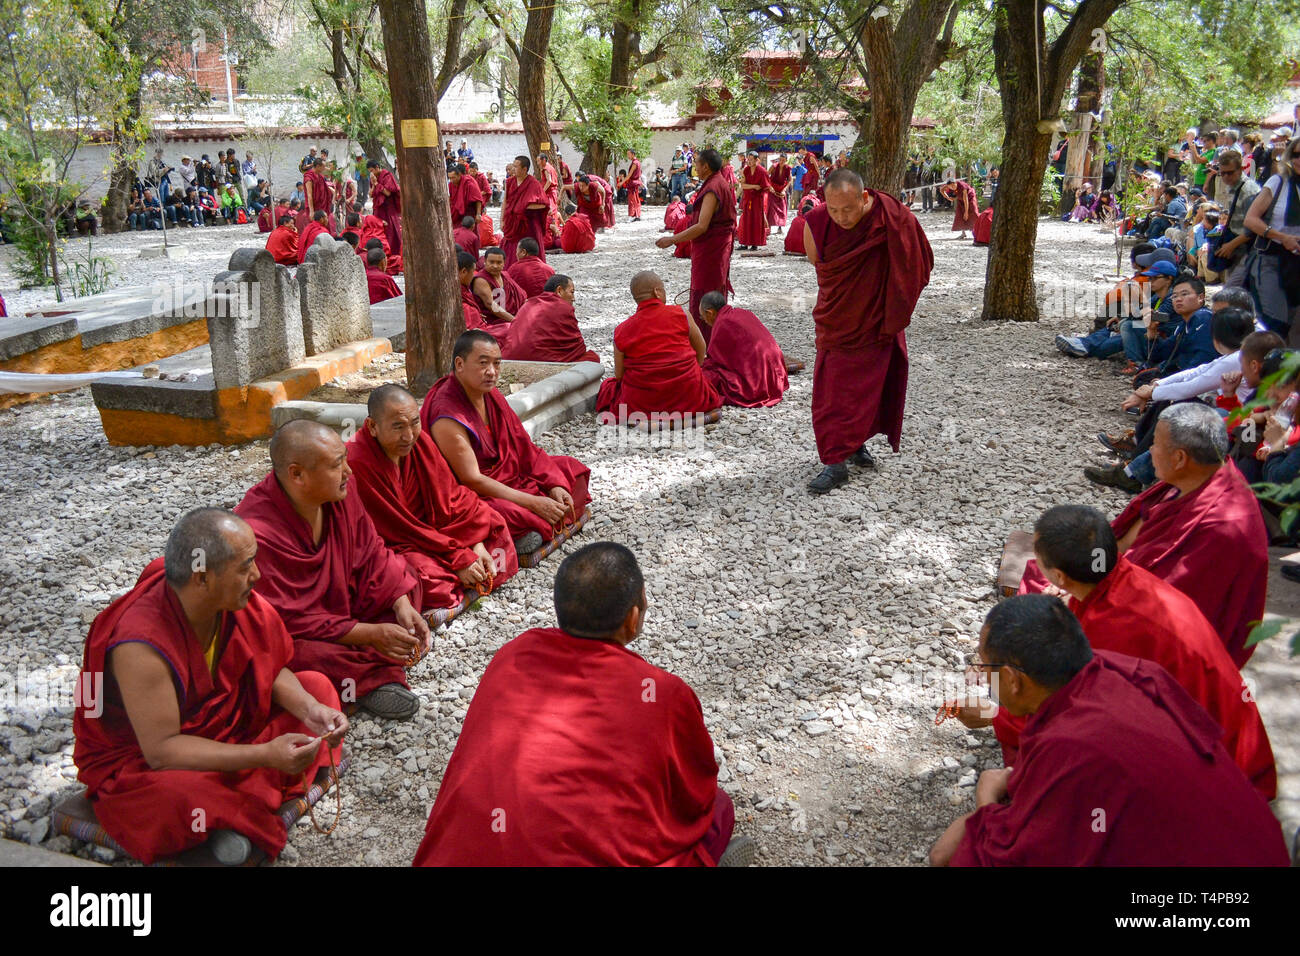 The debates among monks on the Tibetan Buddhism doctrines in Sera Monastery, Lhasa, Tibet - Stock Image